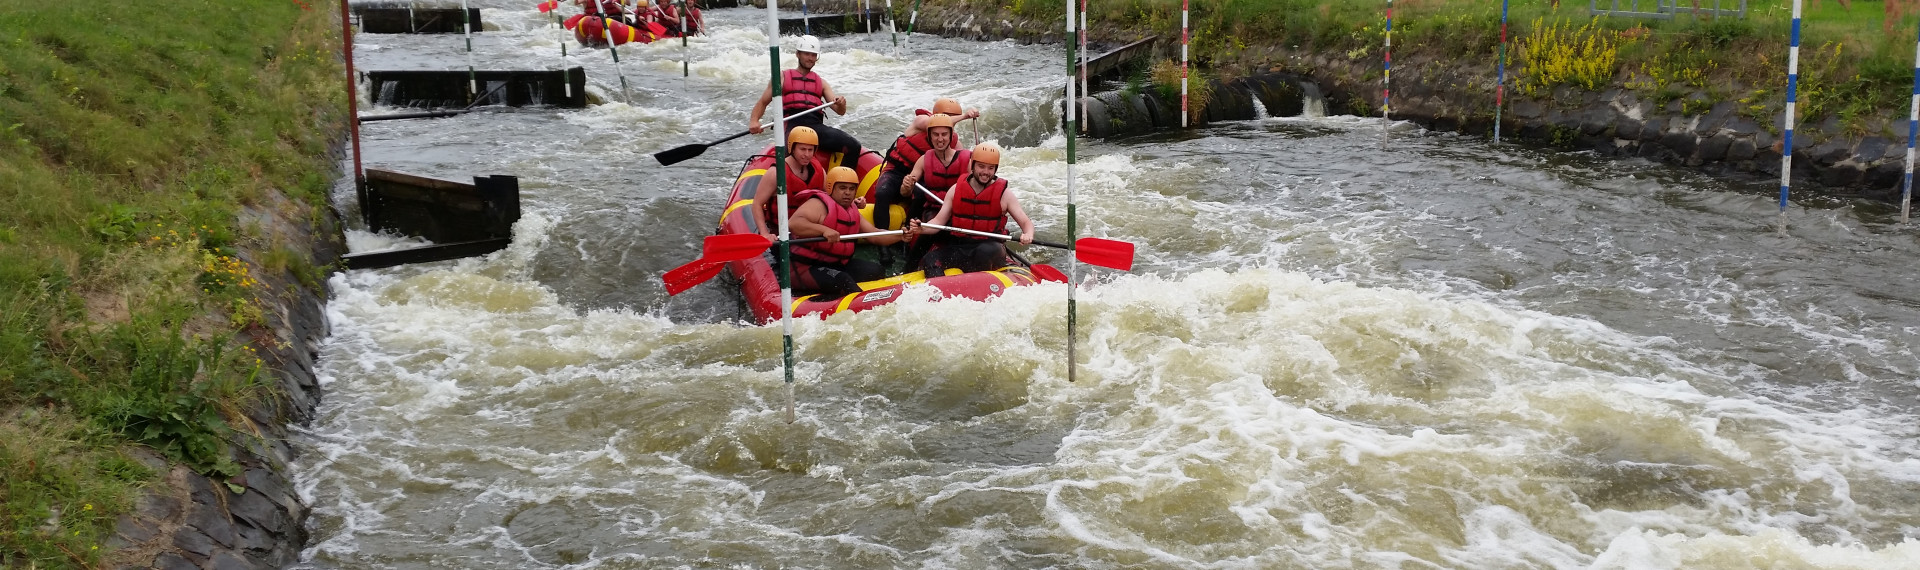 Rafting extrême Prague